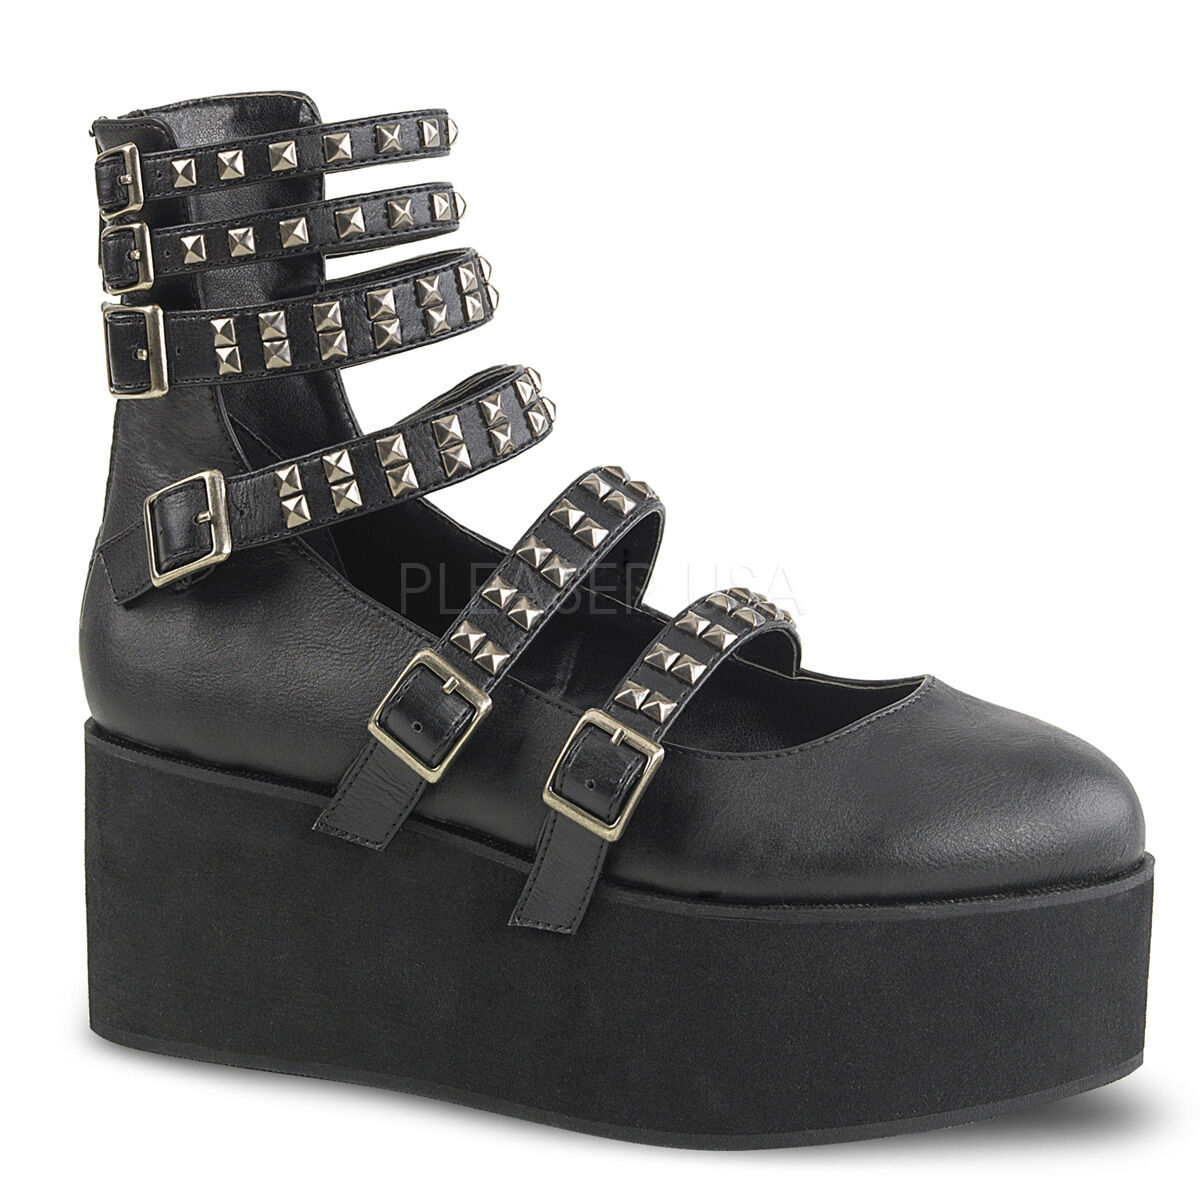 Demonia 2.75  Platform Black Vegan Strap Mary Mary Mary Jane Stud Buckle shoes Goth 6-11 8c14a7